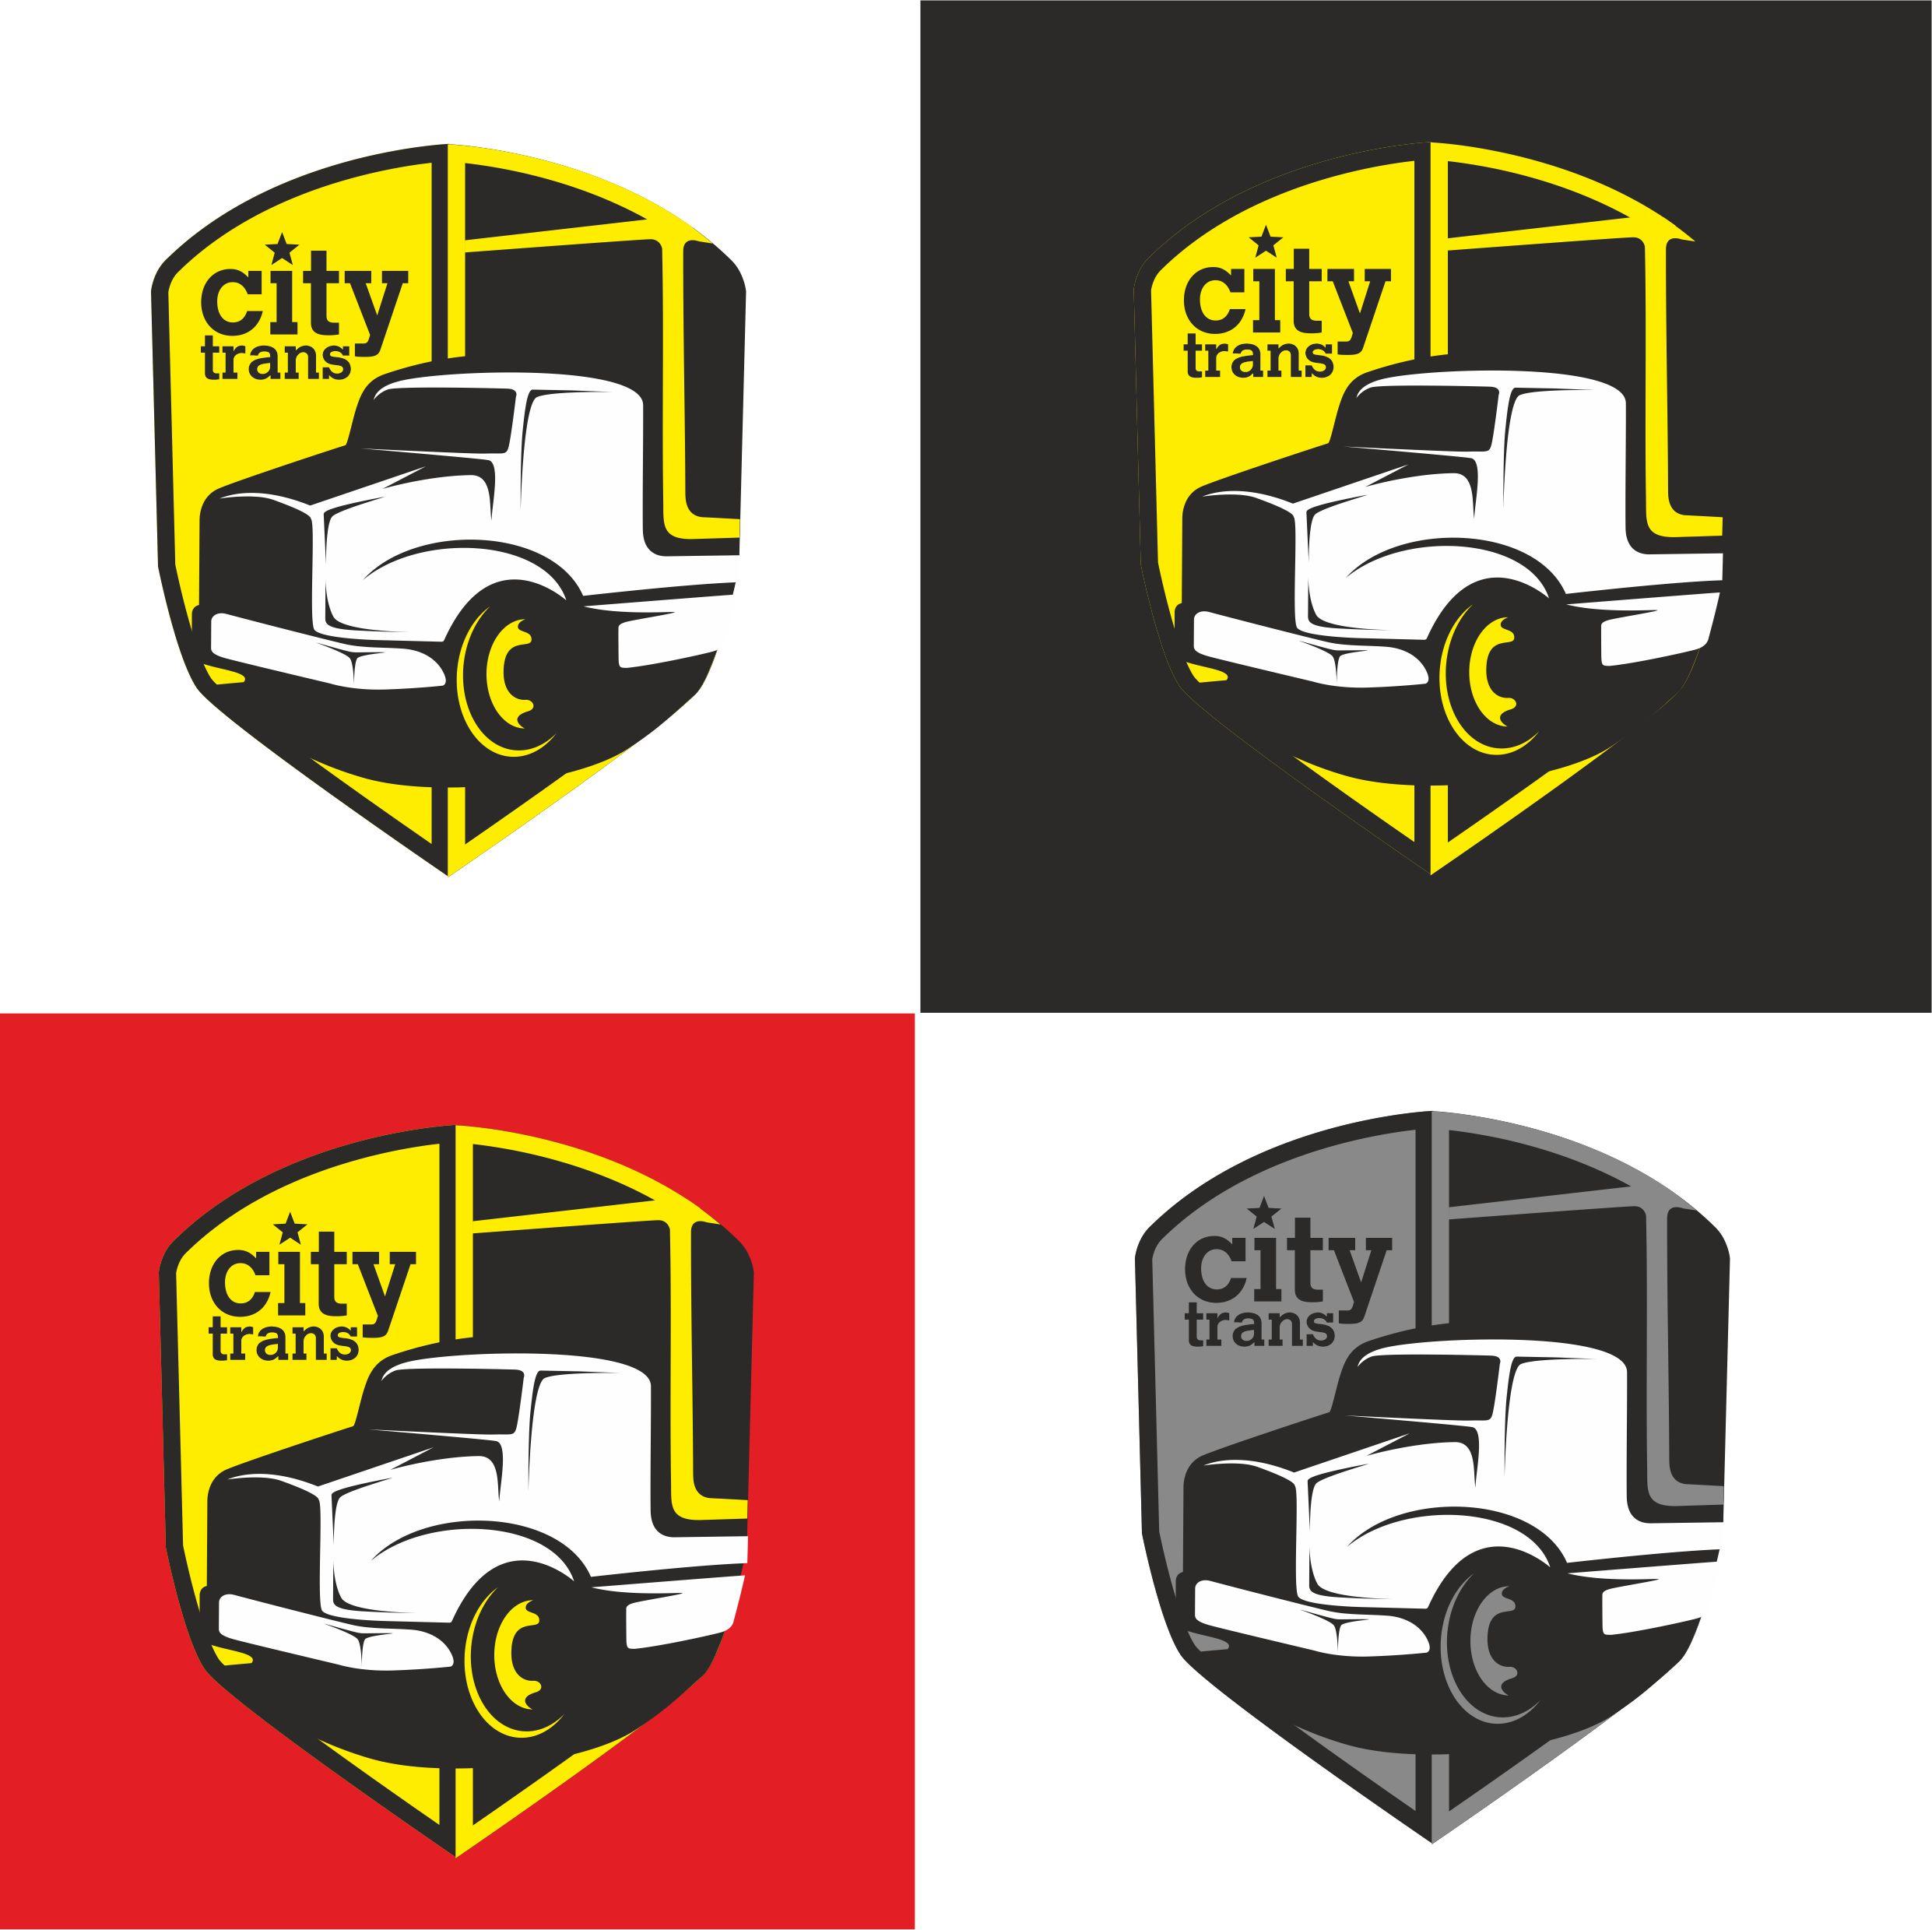 Разработка Логотипа транспортной компании фото f_0935e6e57c0d6240.jpg